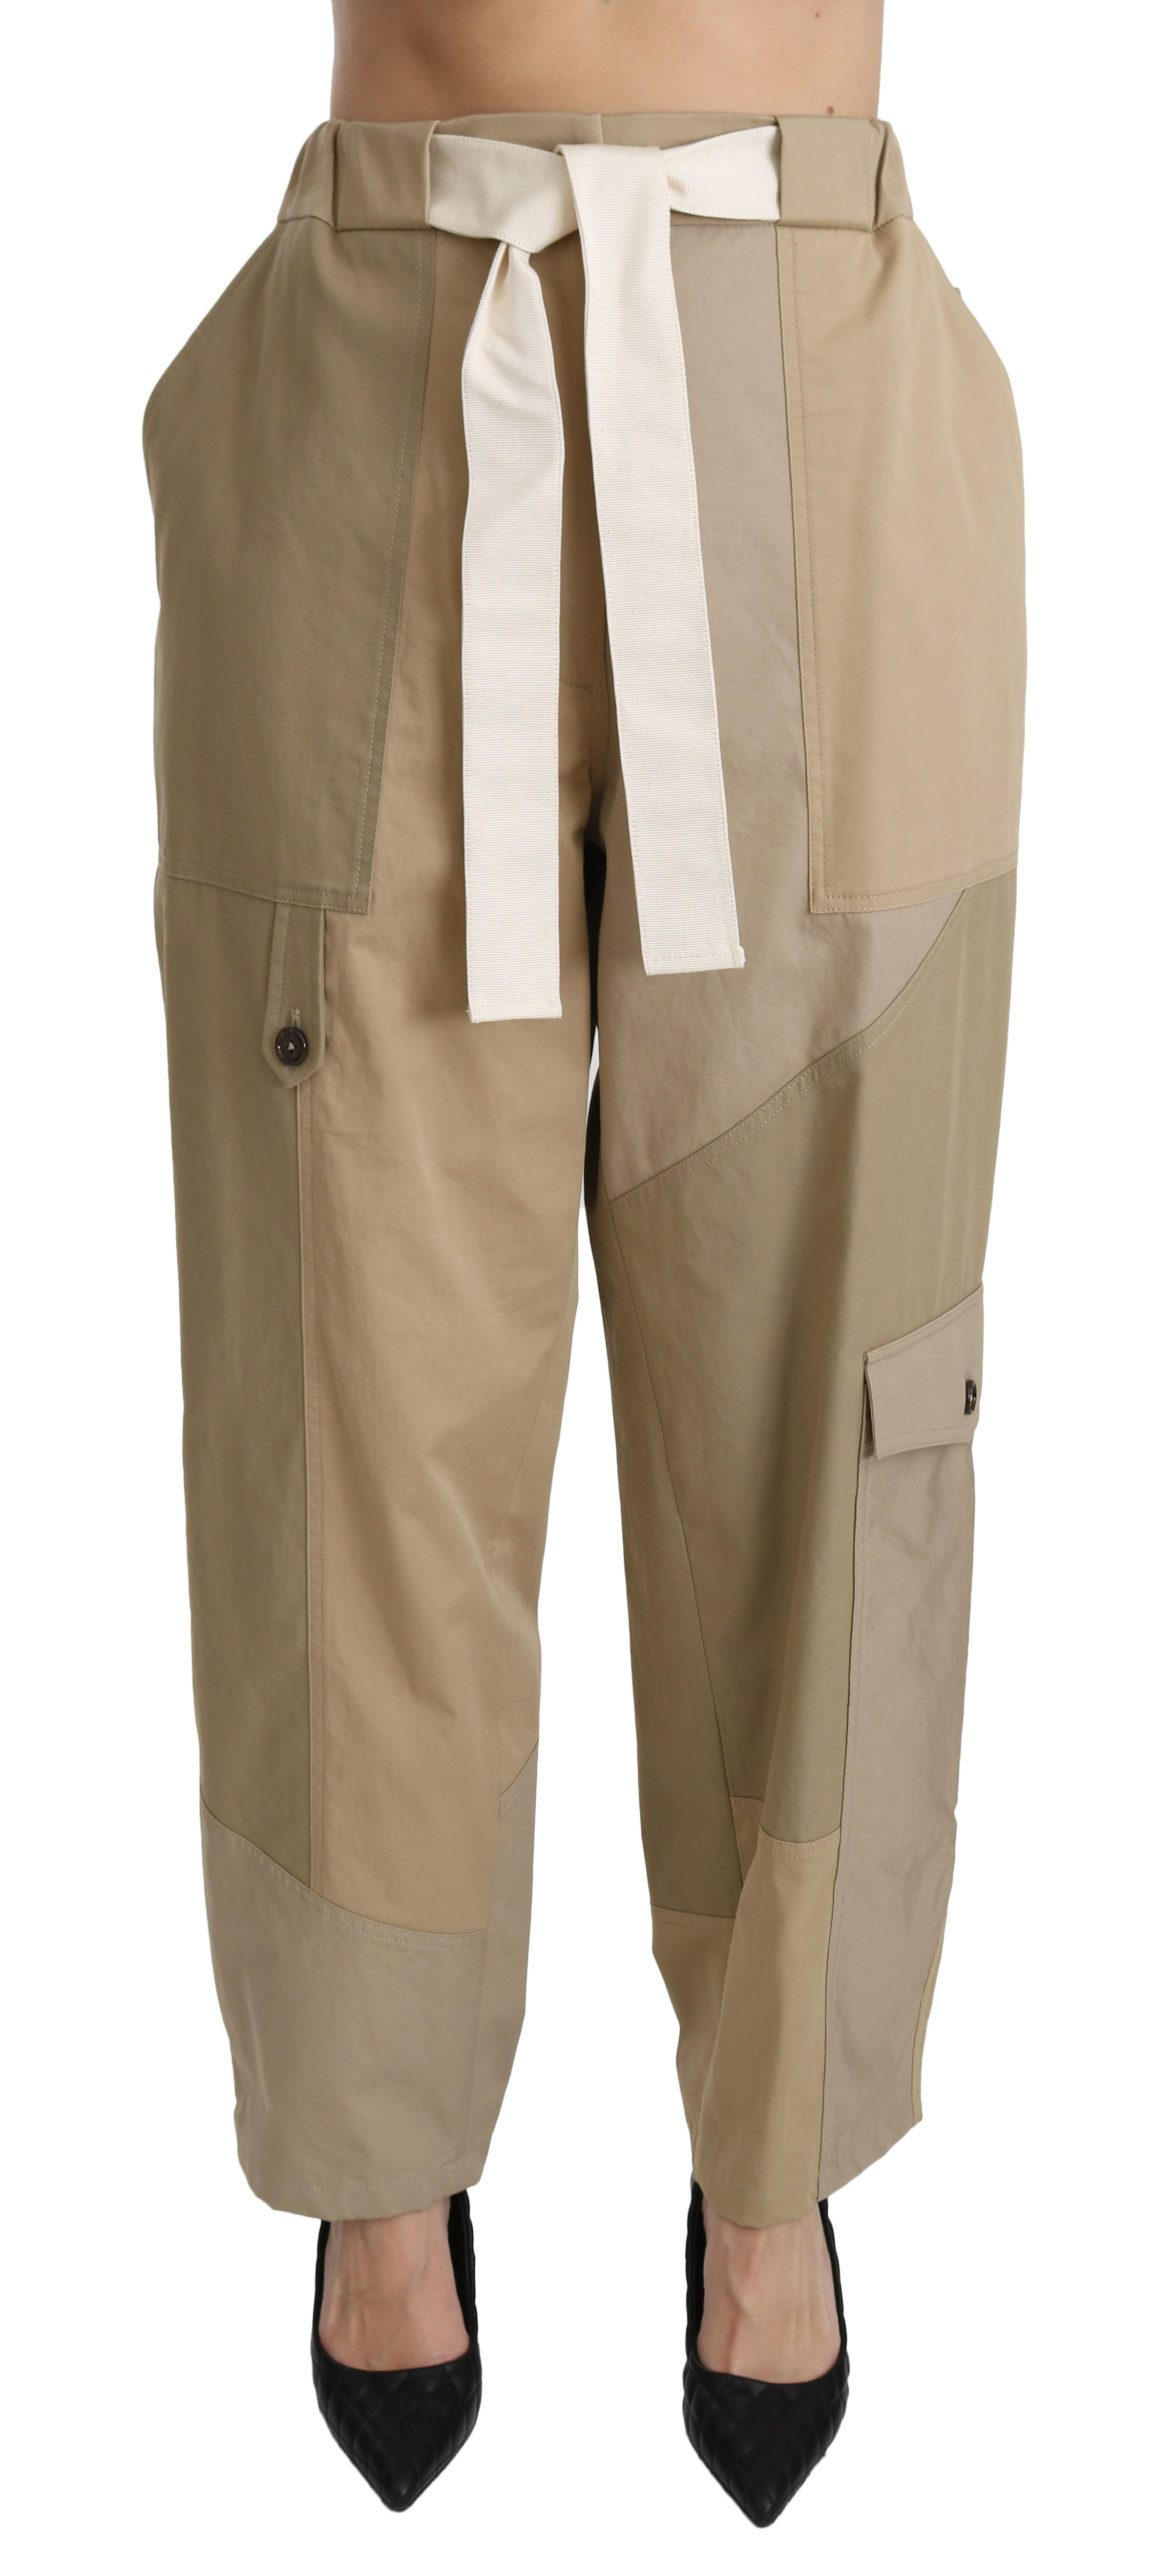 Dolce & Gabbana Women's High Waist Straight Cotton Trouser Beige PAN70846 - IT40|S